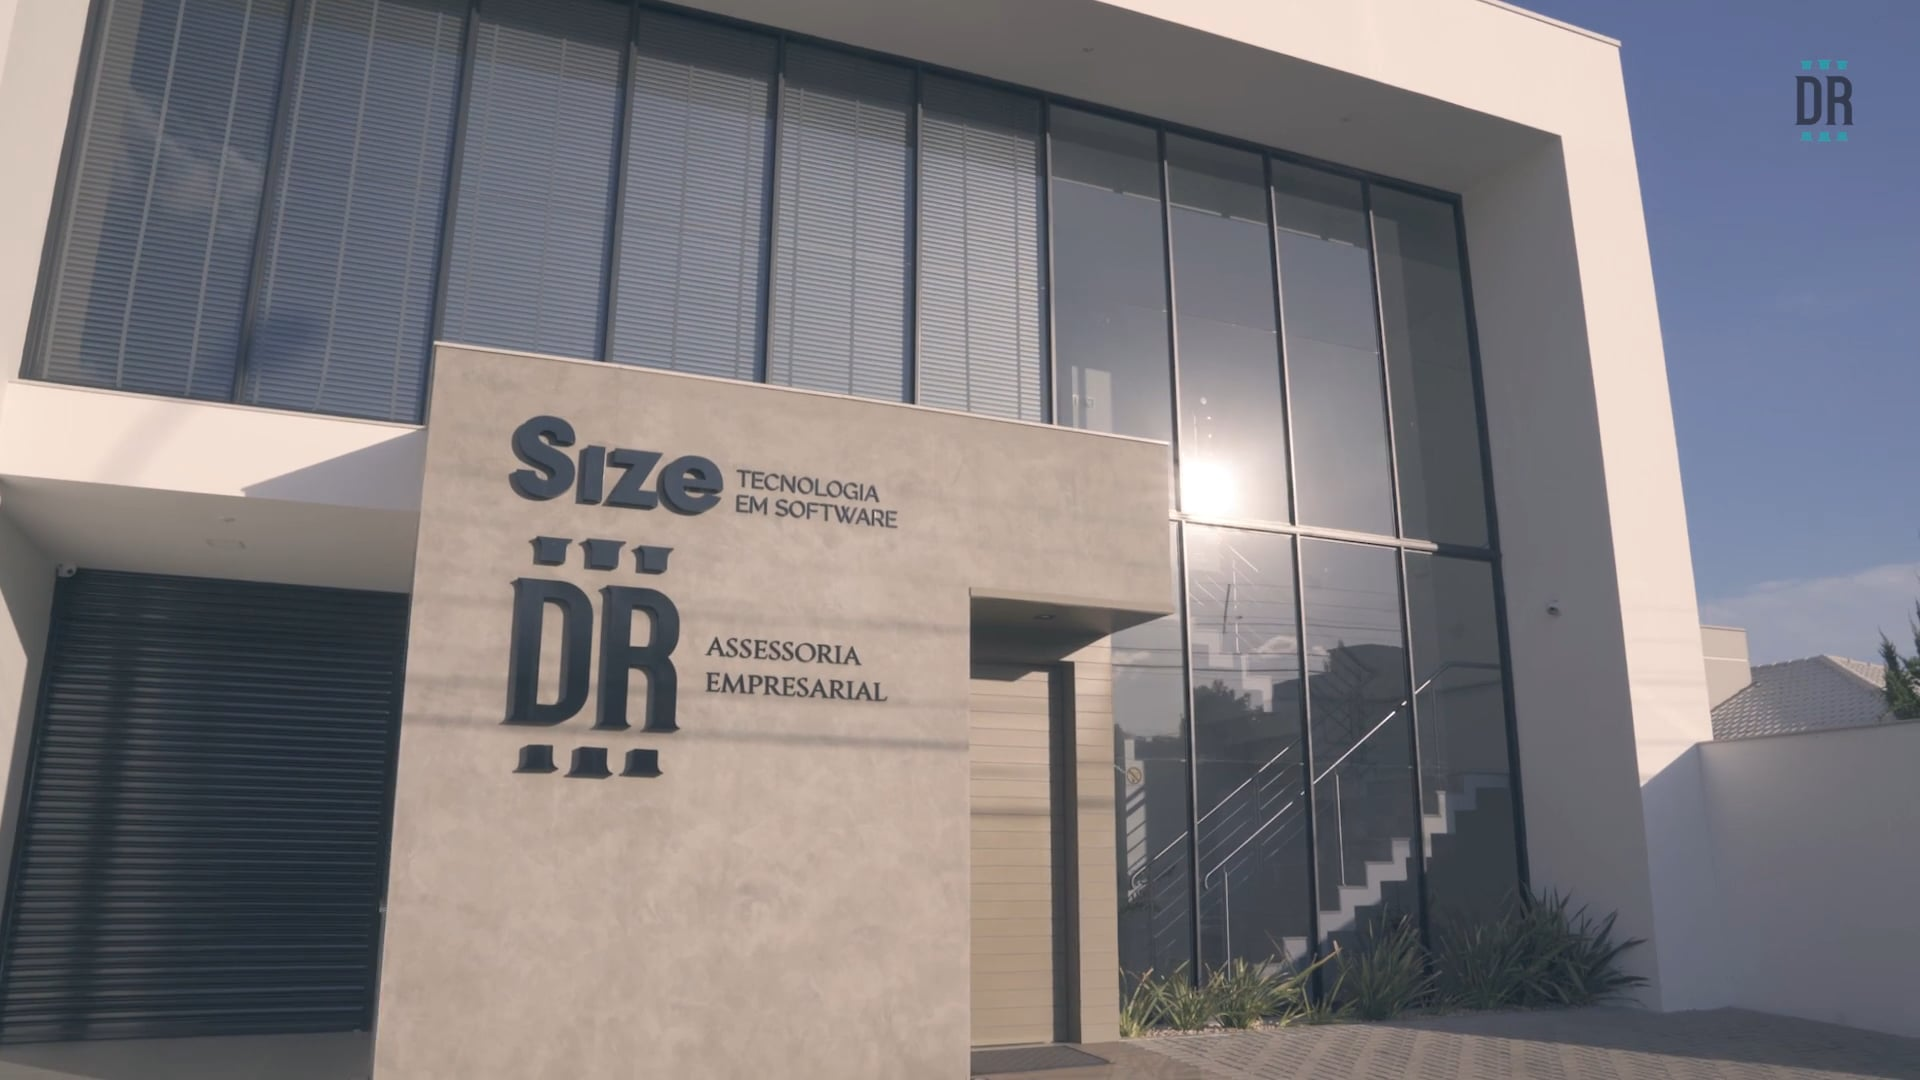 DR Assessoria Empresarial - Video Institucional